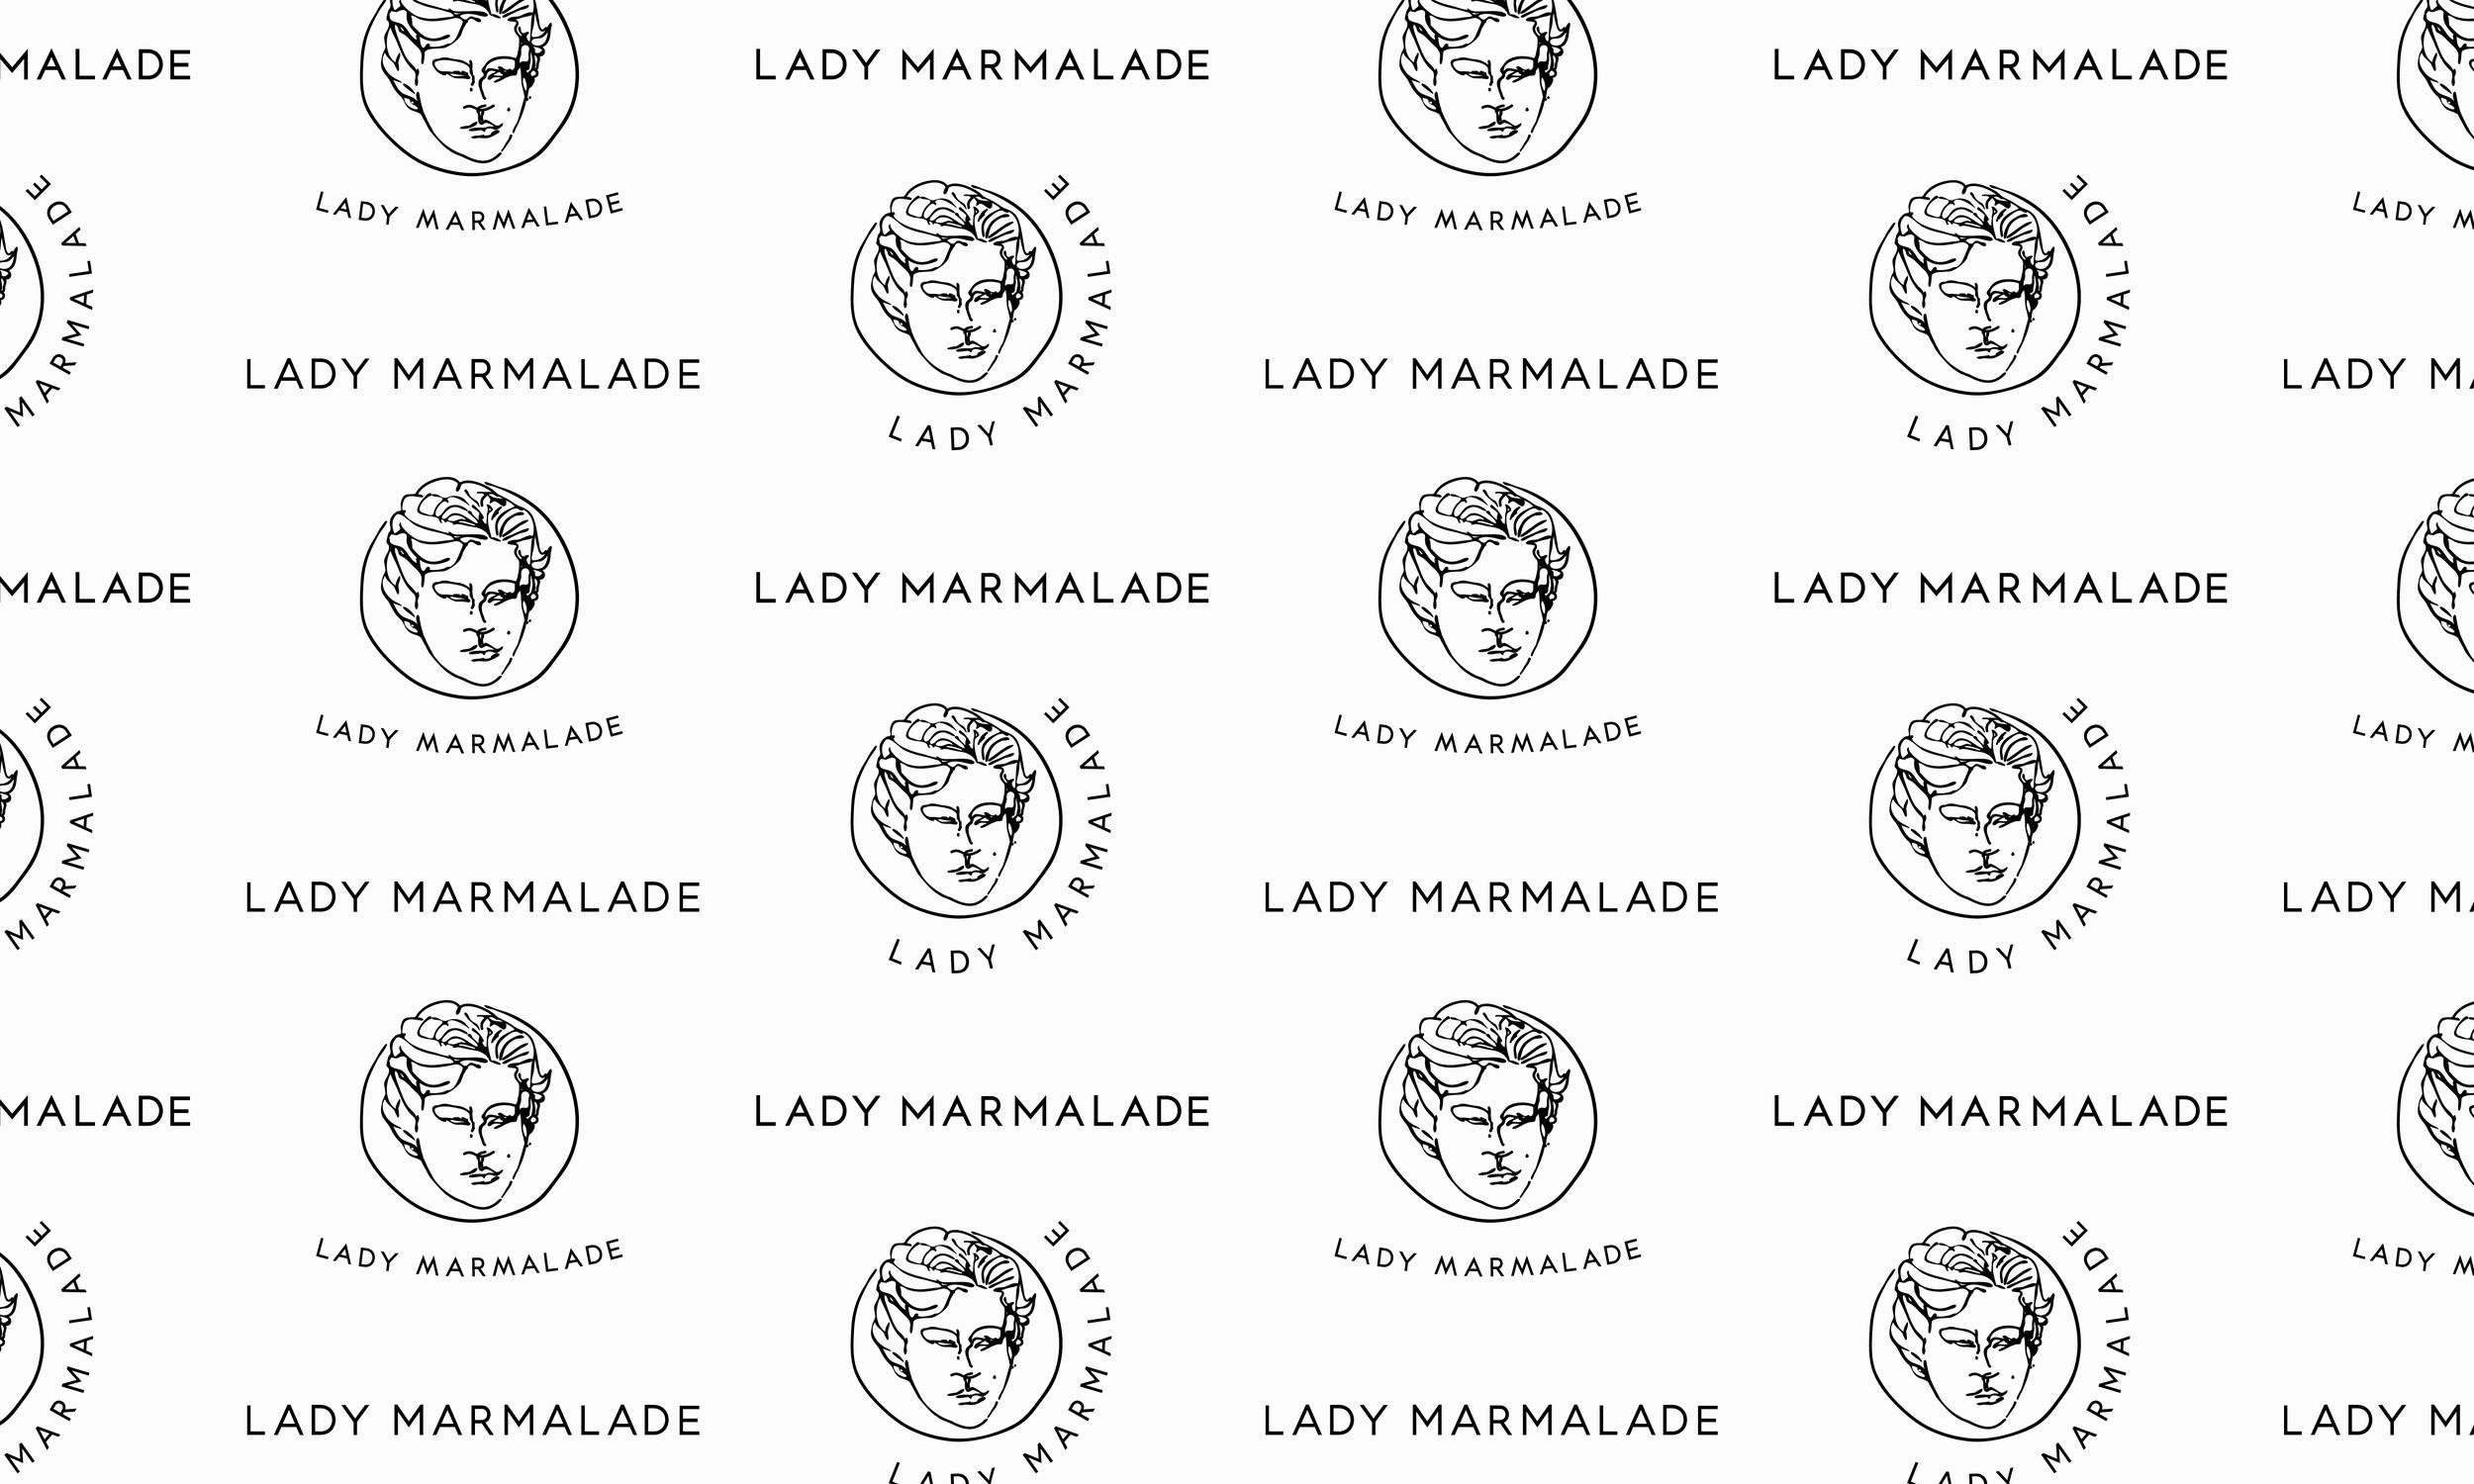 LadyMarmaladeBranding-05.png